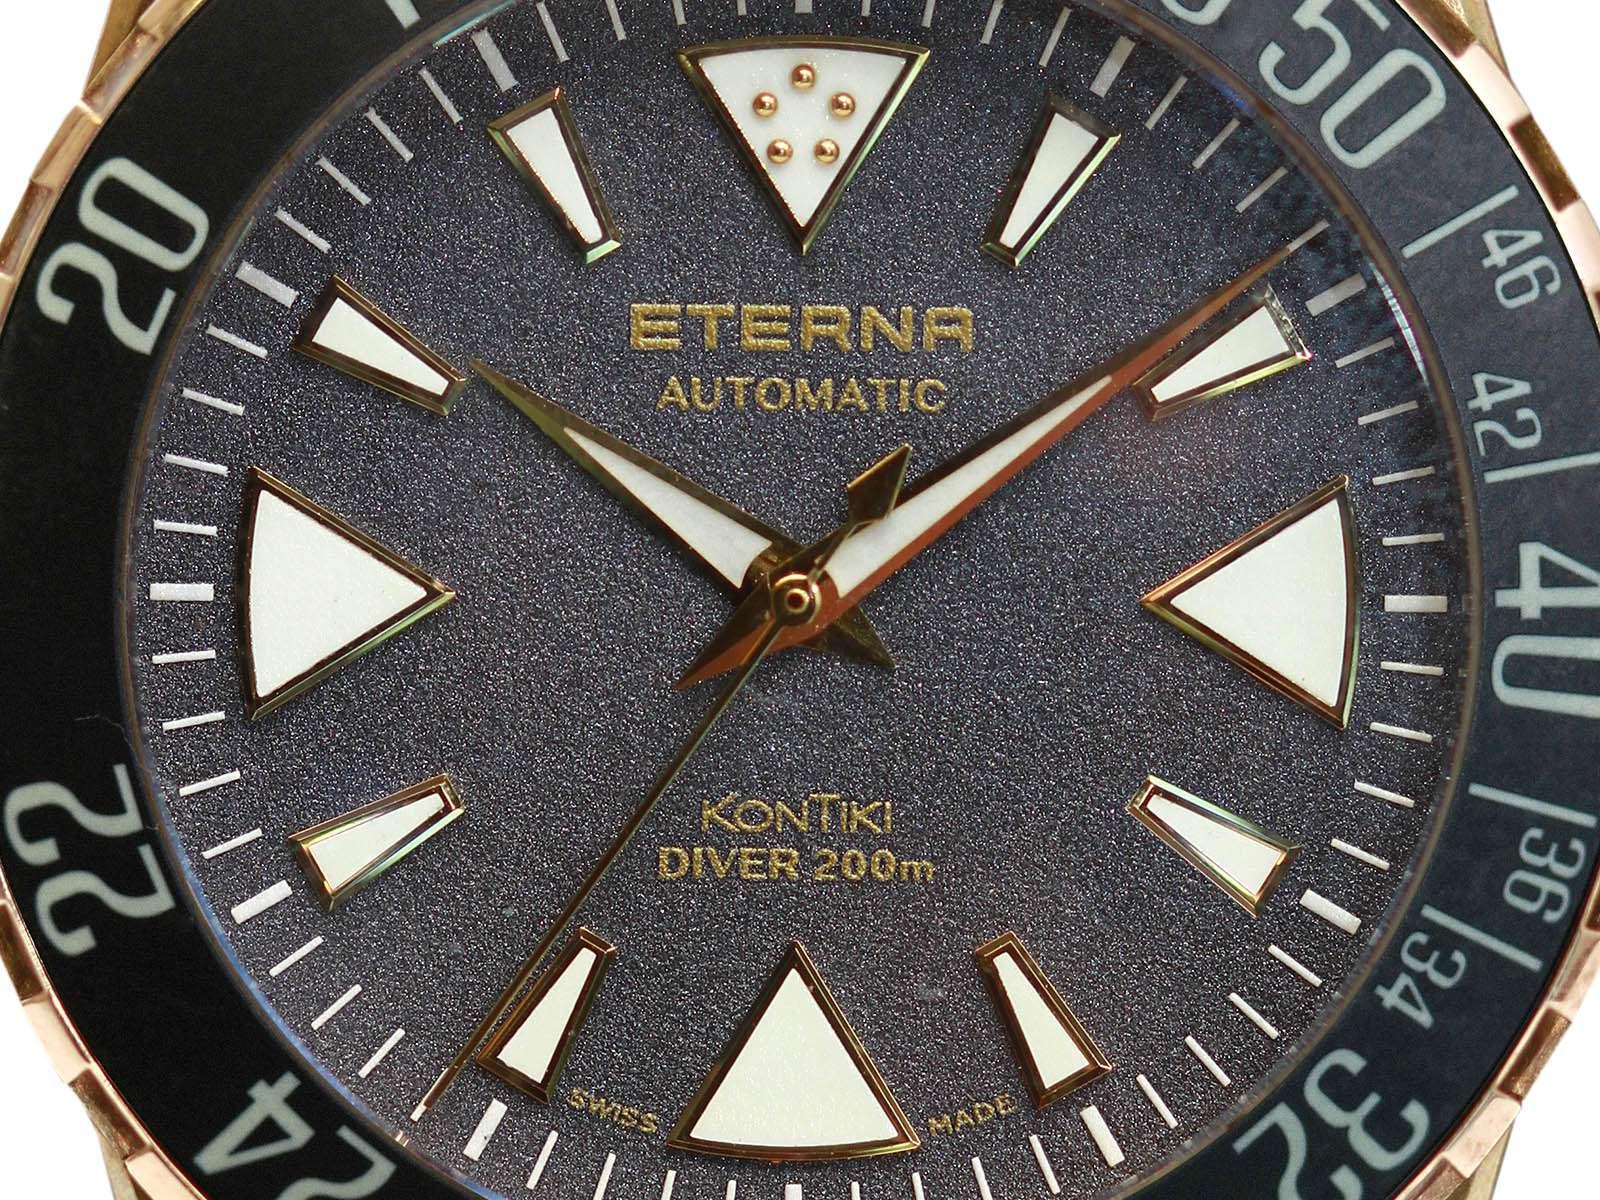 Eterna-Kontiki-Bronze-L-E-BAselworld-2017-1.jpg